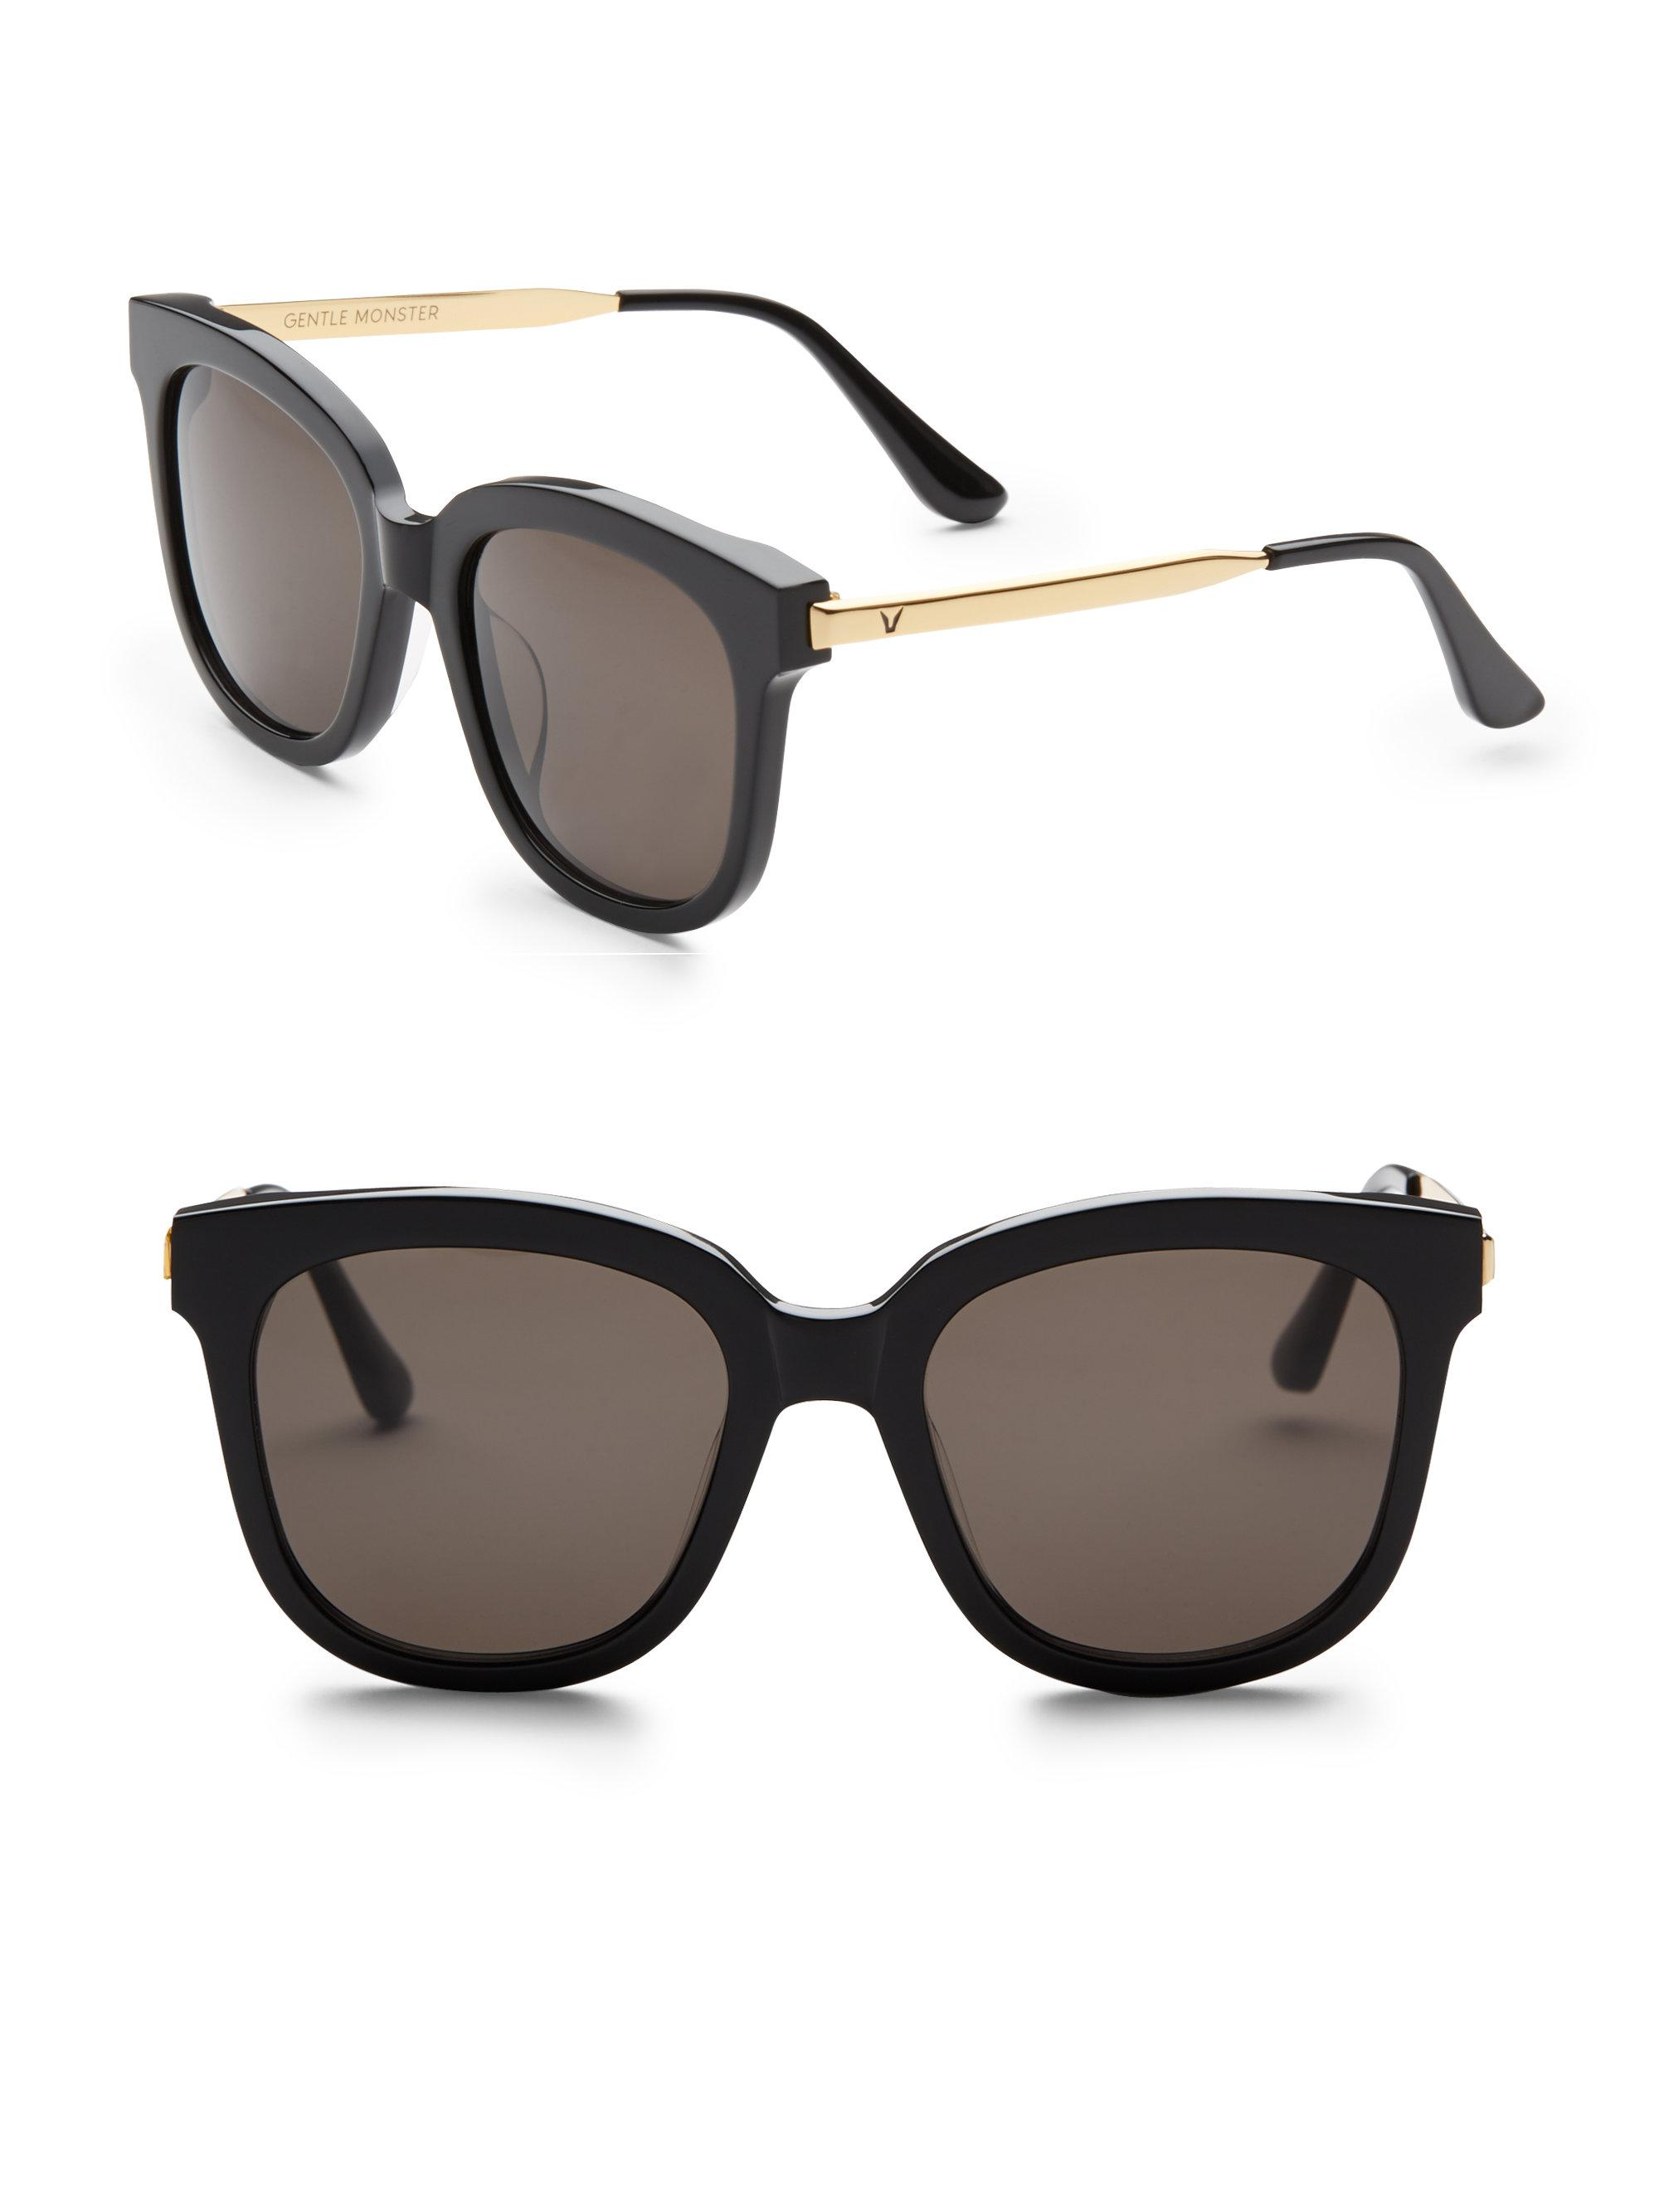 81f6b3203b Lyst - Gentle Monster Absente 54mm Oversize Sunglasses in Black